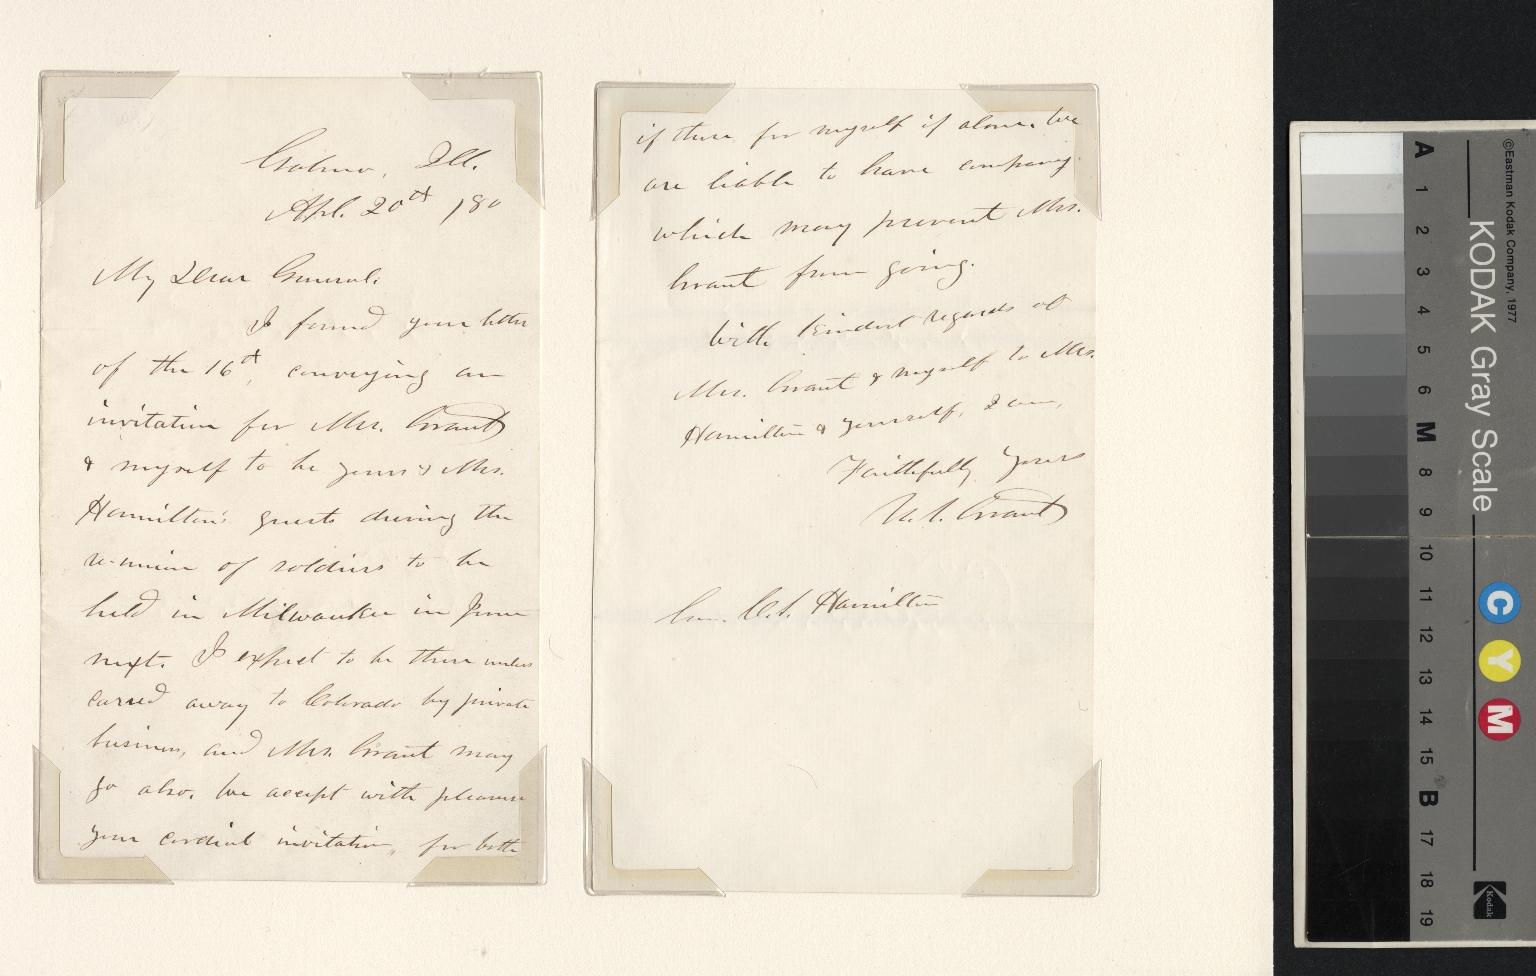 Ulysses S. Grant letter to General Hamilton